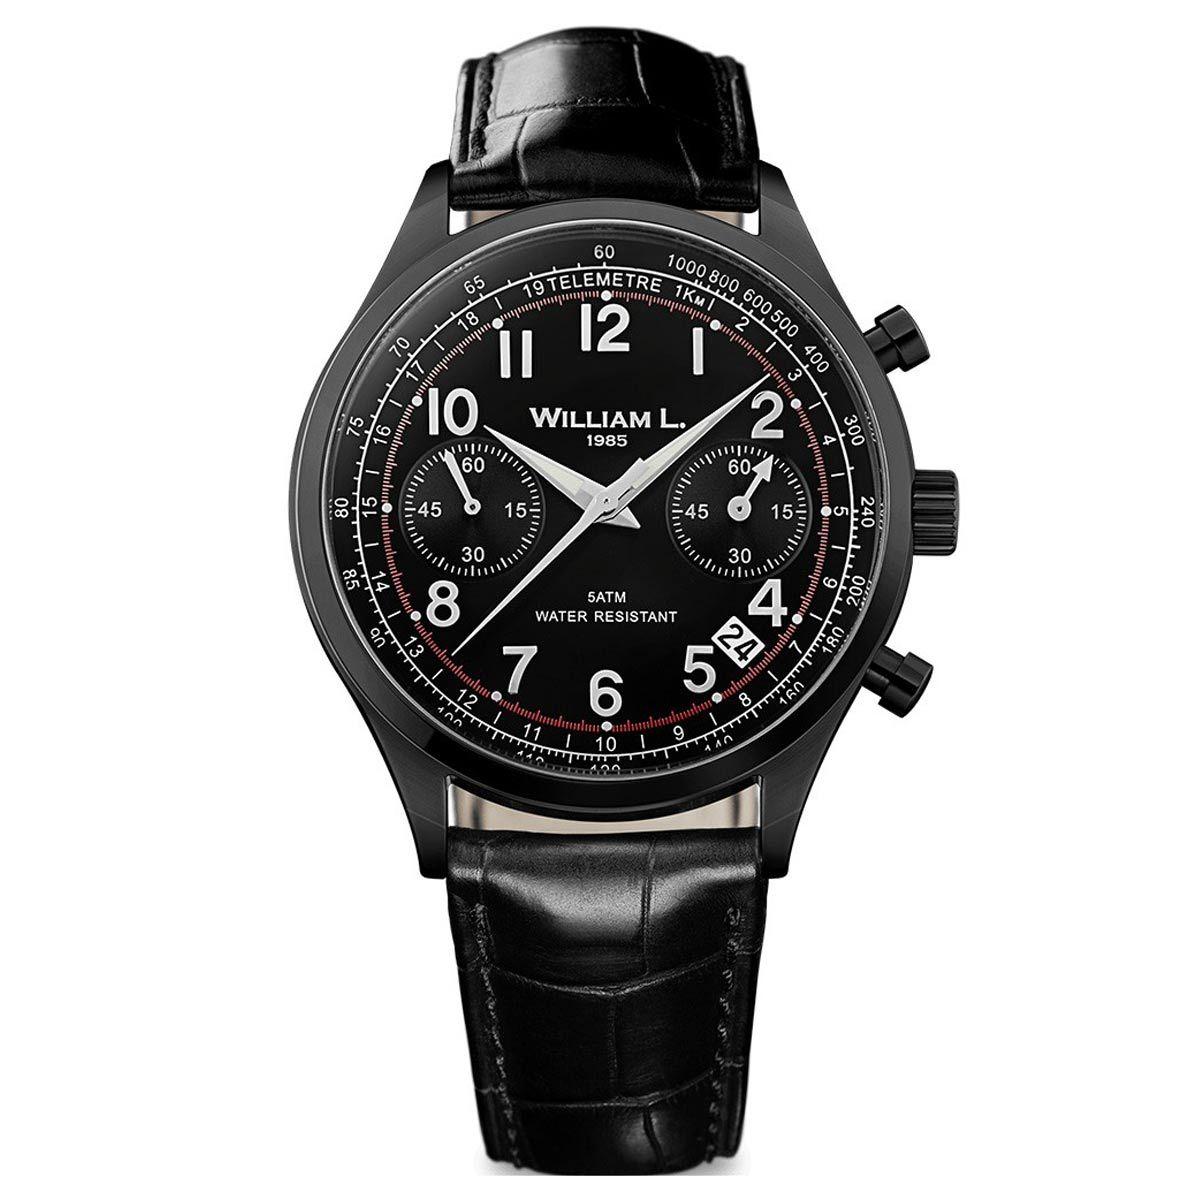 William L. 1985 WLIB01NRCN Men's Chronographs Vintage Style Black Strap Black IP Steel Watch